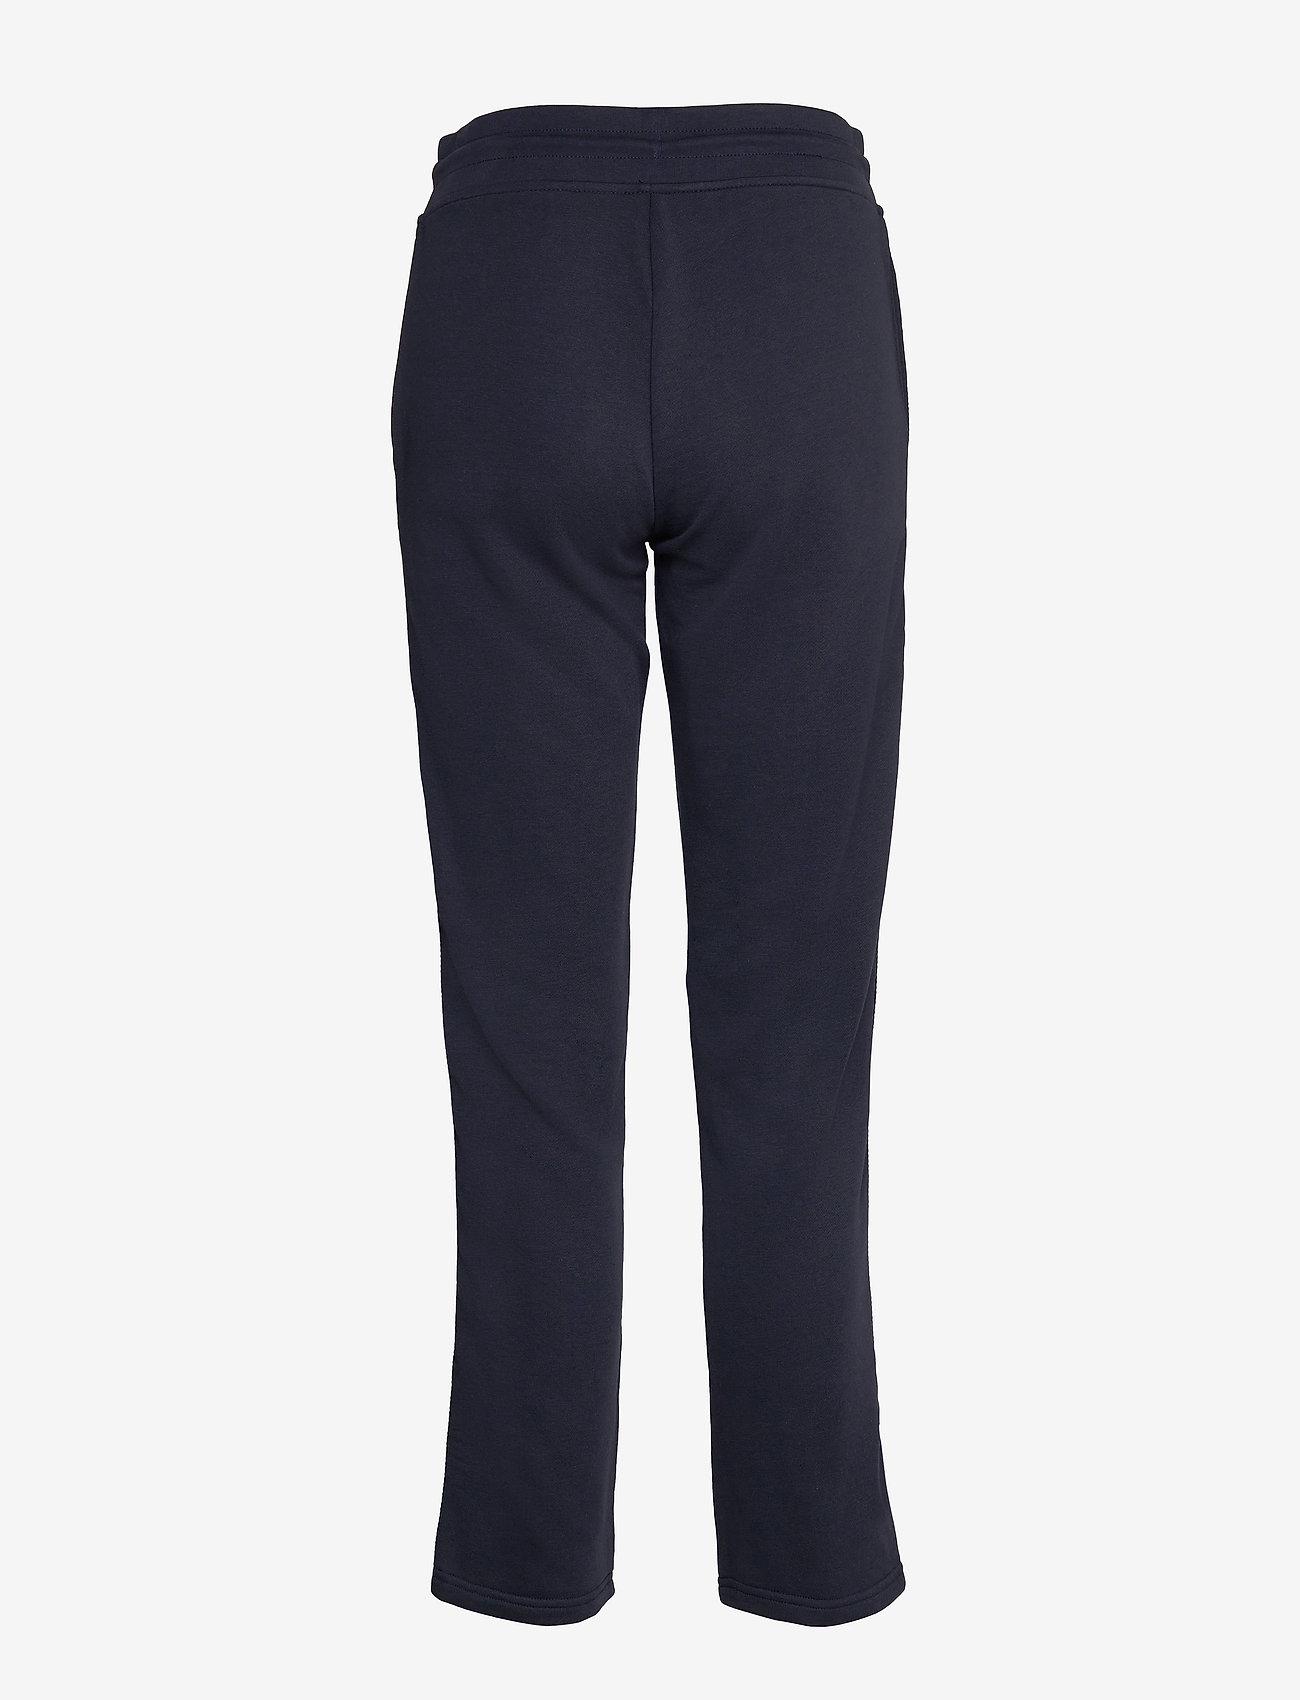 Gant D1. 13 Stripes Sweat Pants - Sweatpants